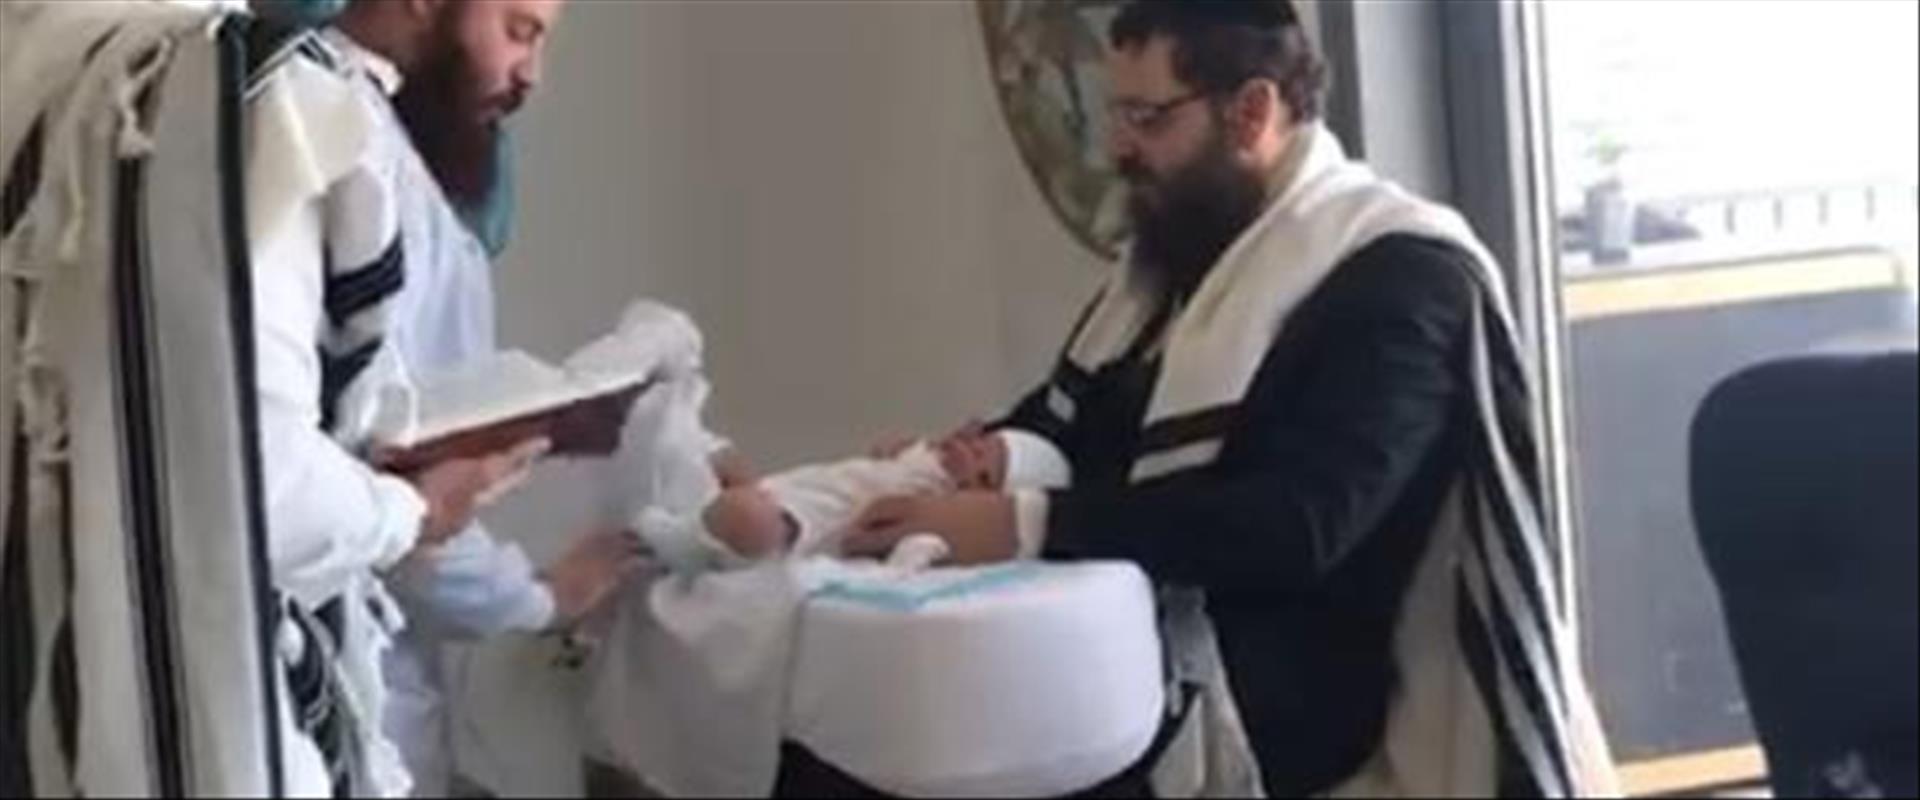 première circoncision en Arabie Saoudite